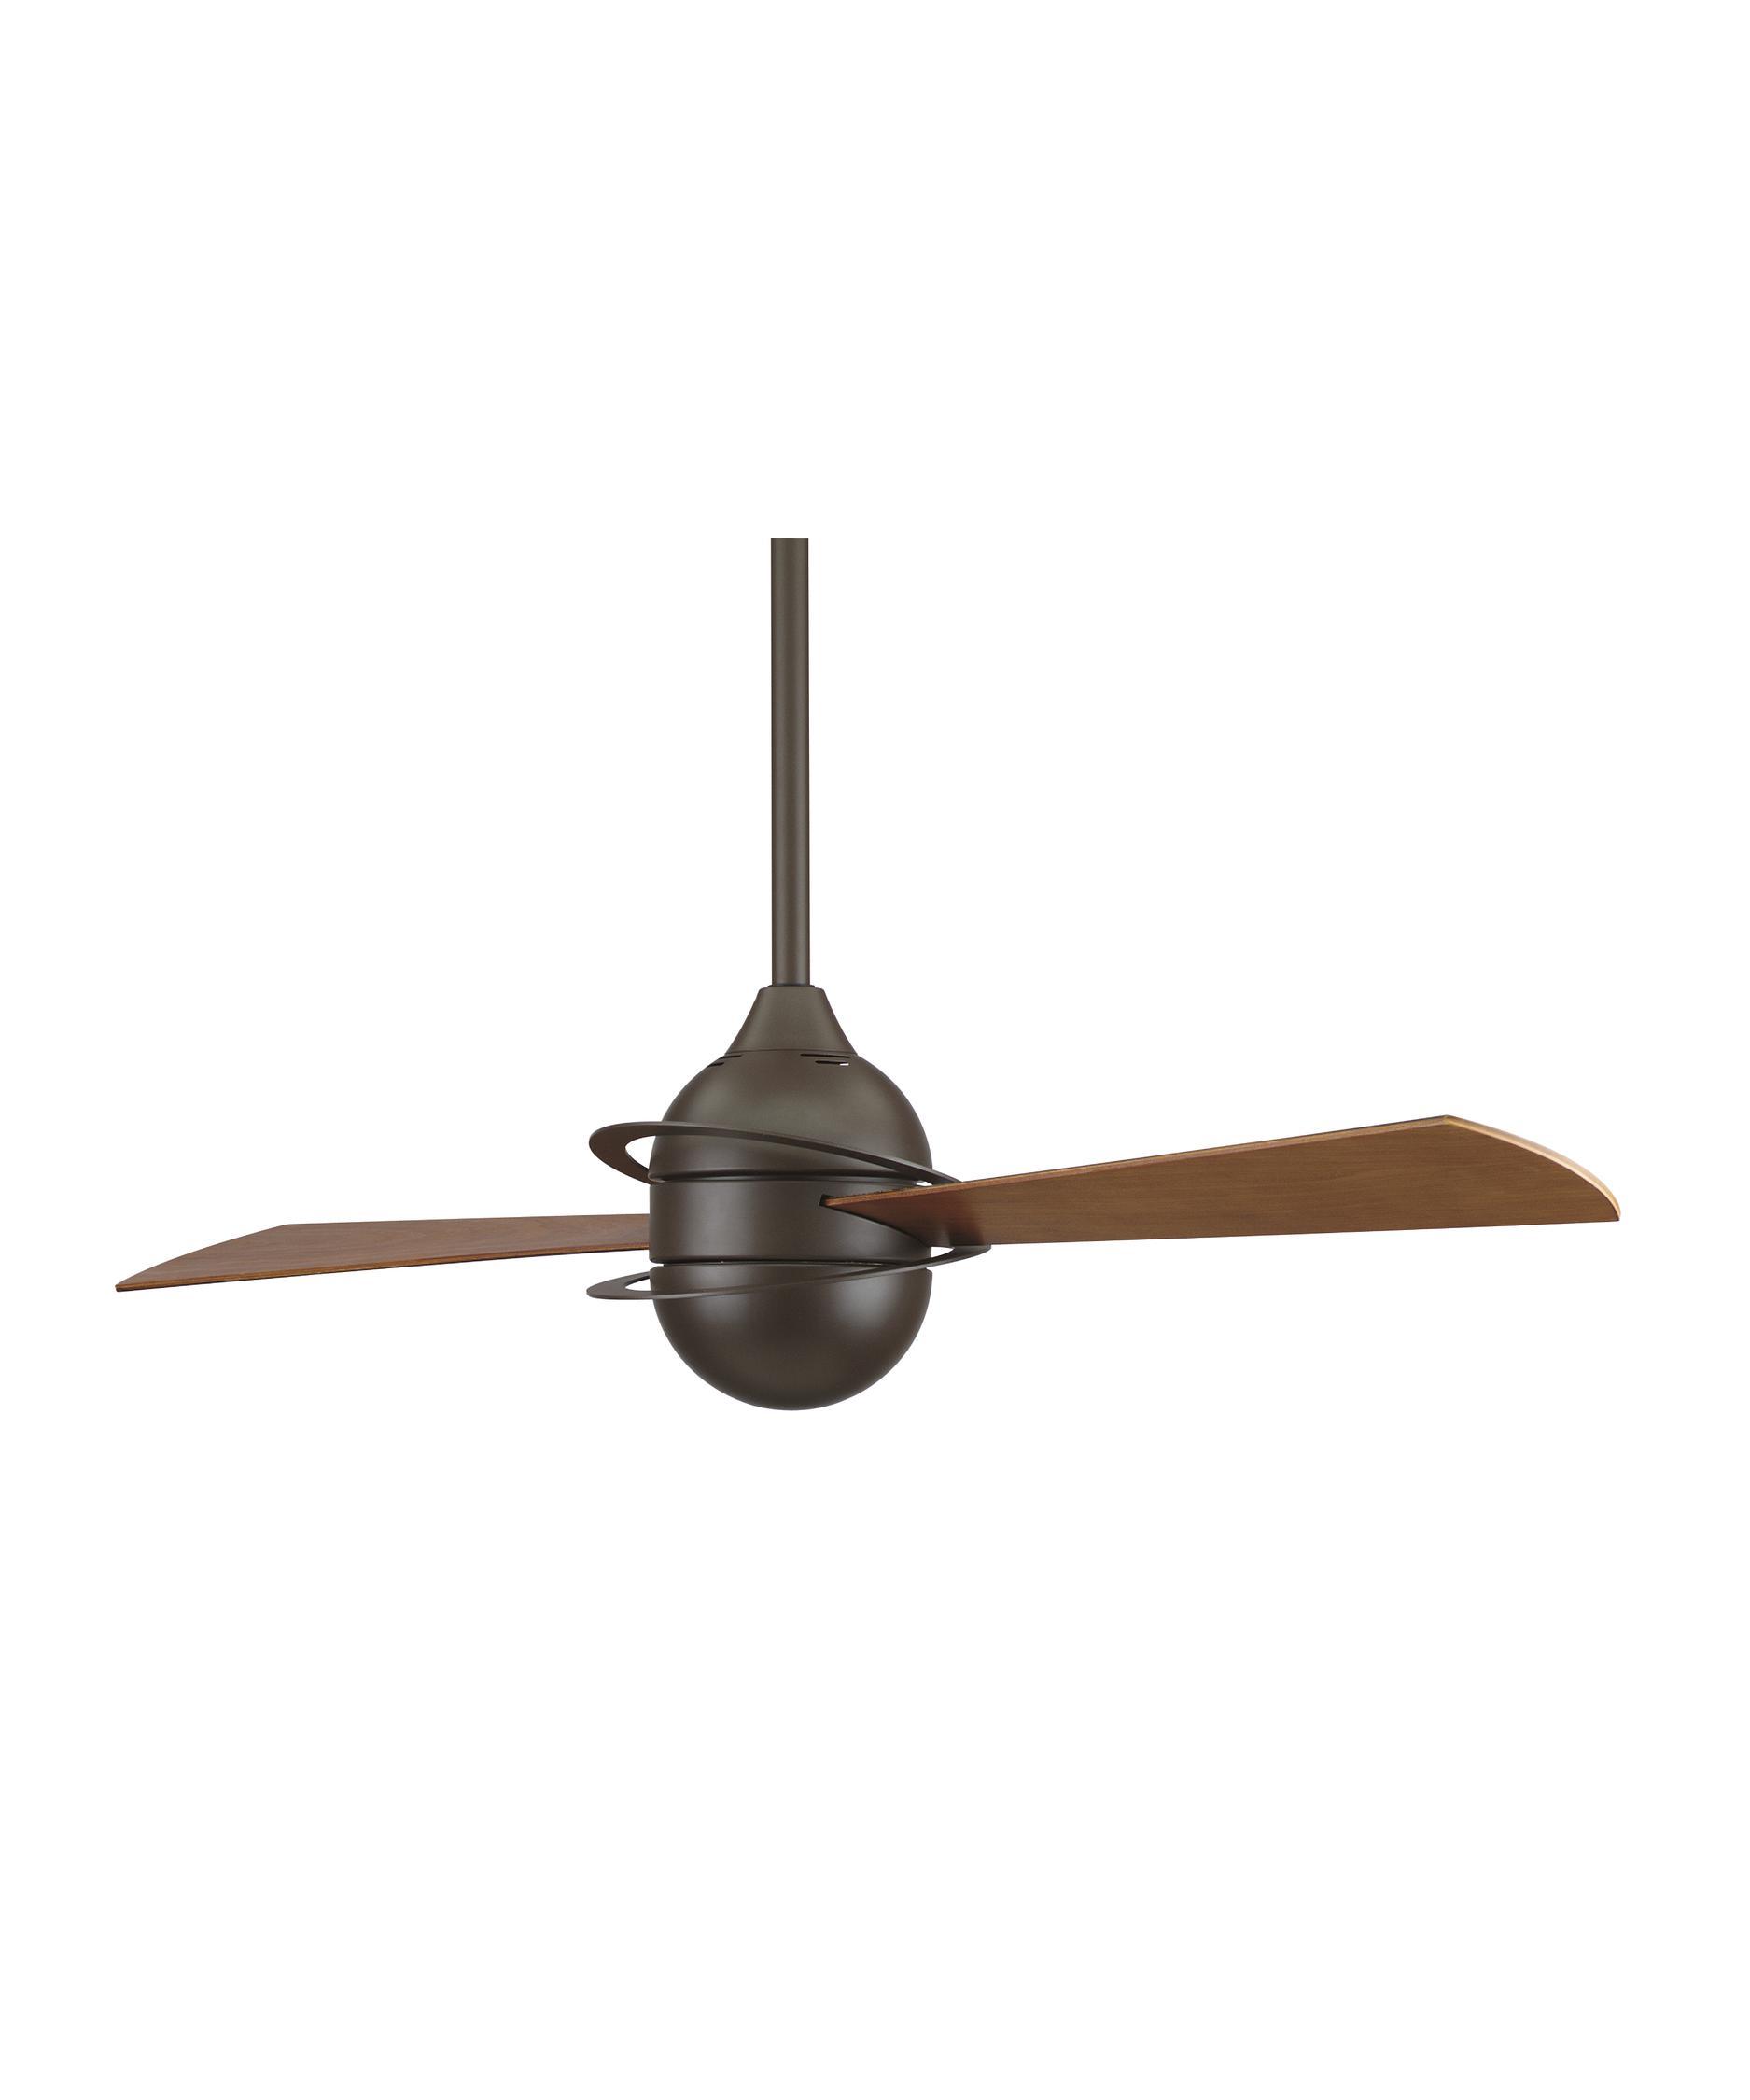 fanimation fp involution  inch  blade ceiling fan  - shown in oil rubbed bronze finish